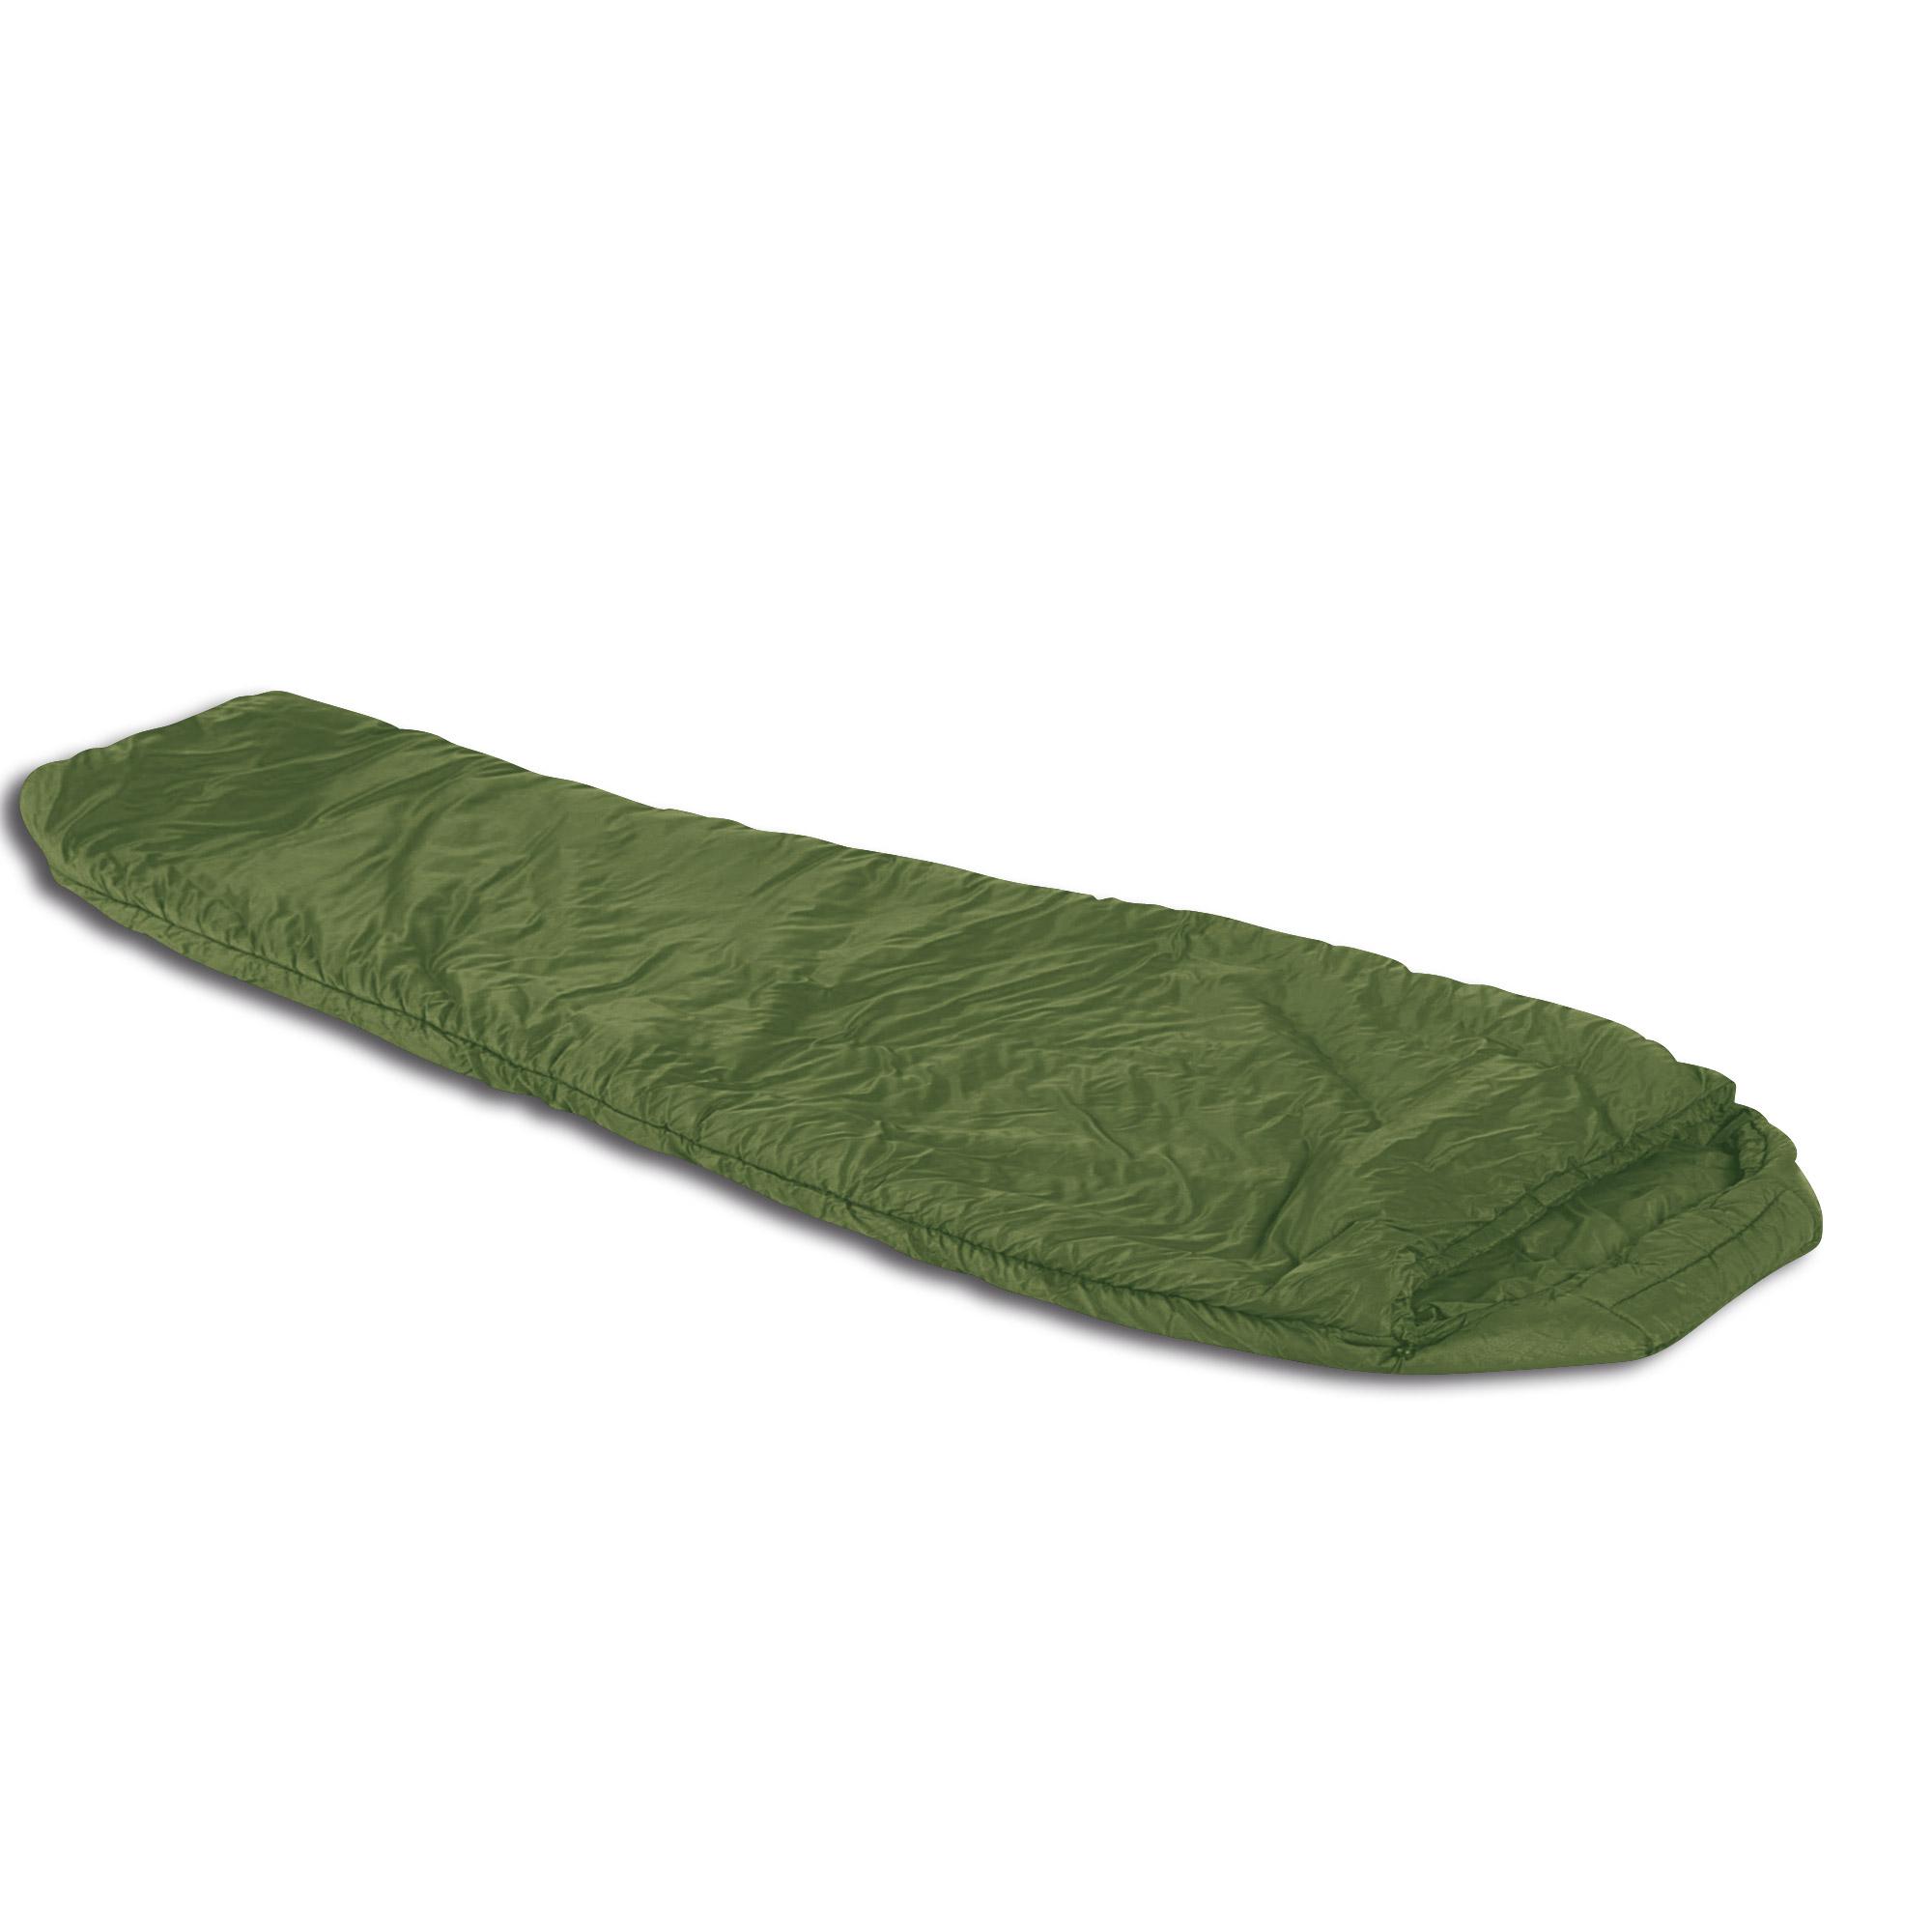 Schlafsack Snugpak Softie 6 Kestrel